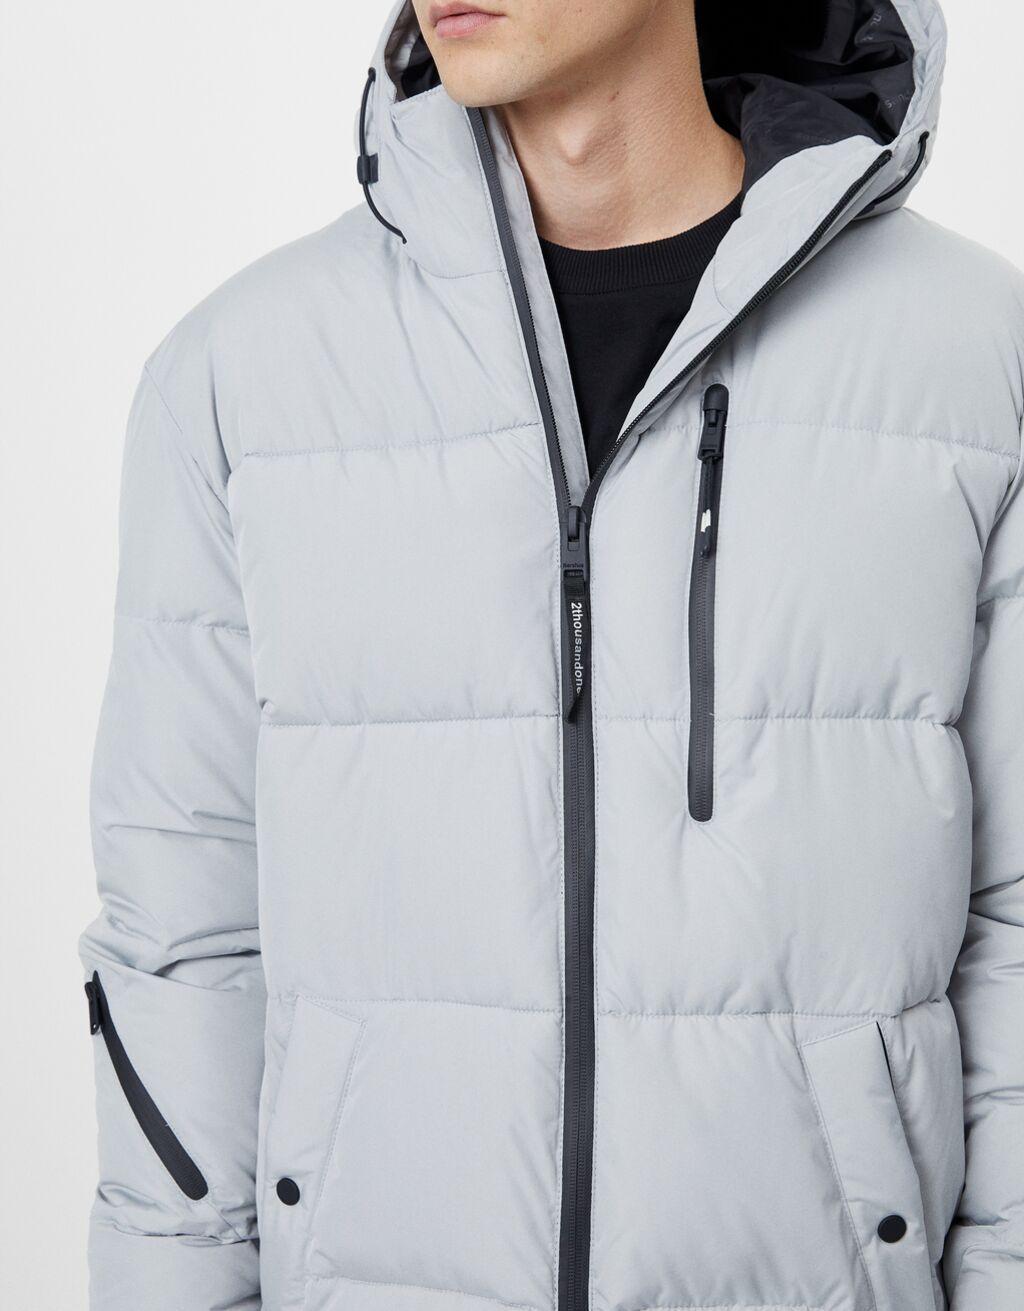 Long Puffer Coat Jackets And Coats Man Bershka Long Puffer Coat Puffer Jacket Men Puffer Coat [ 1311 x 1024 Pixel ]